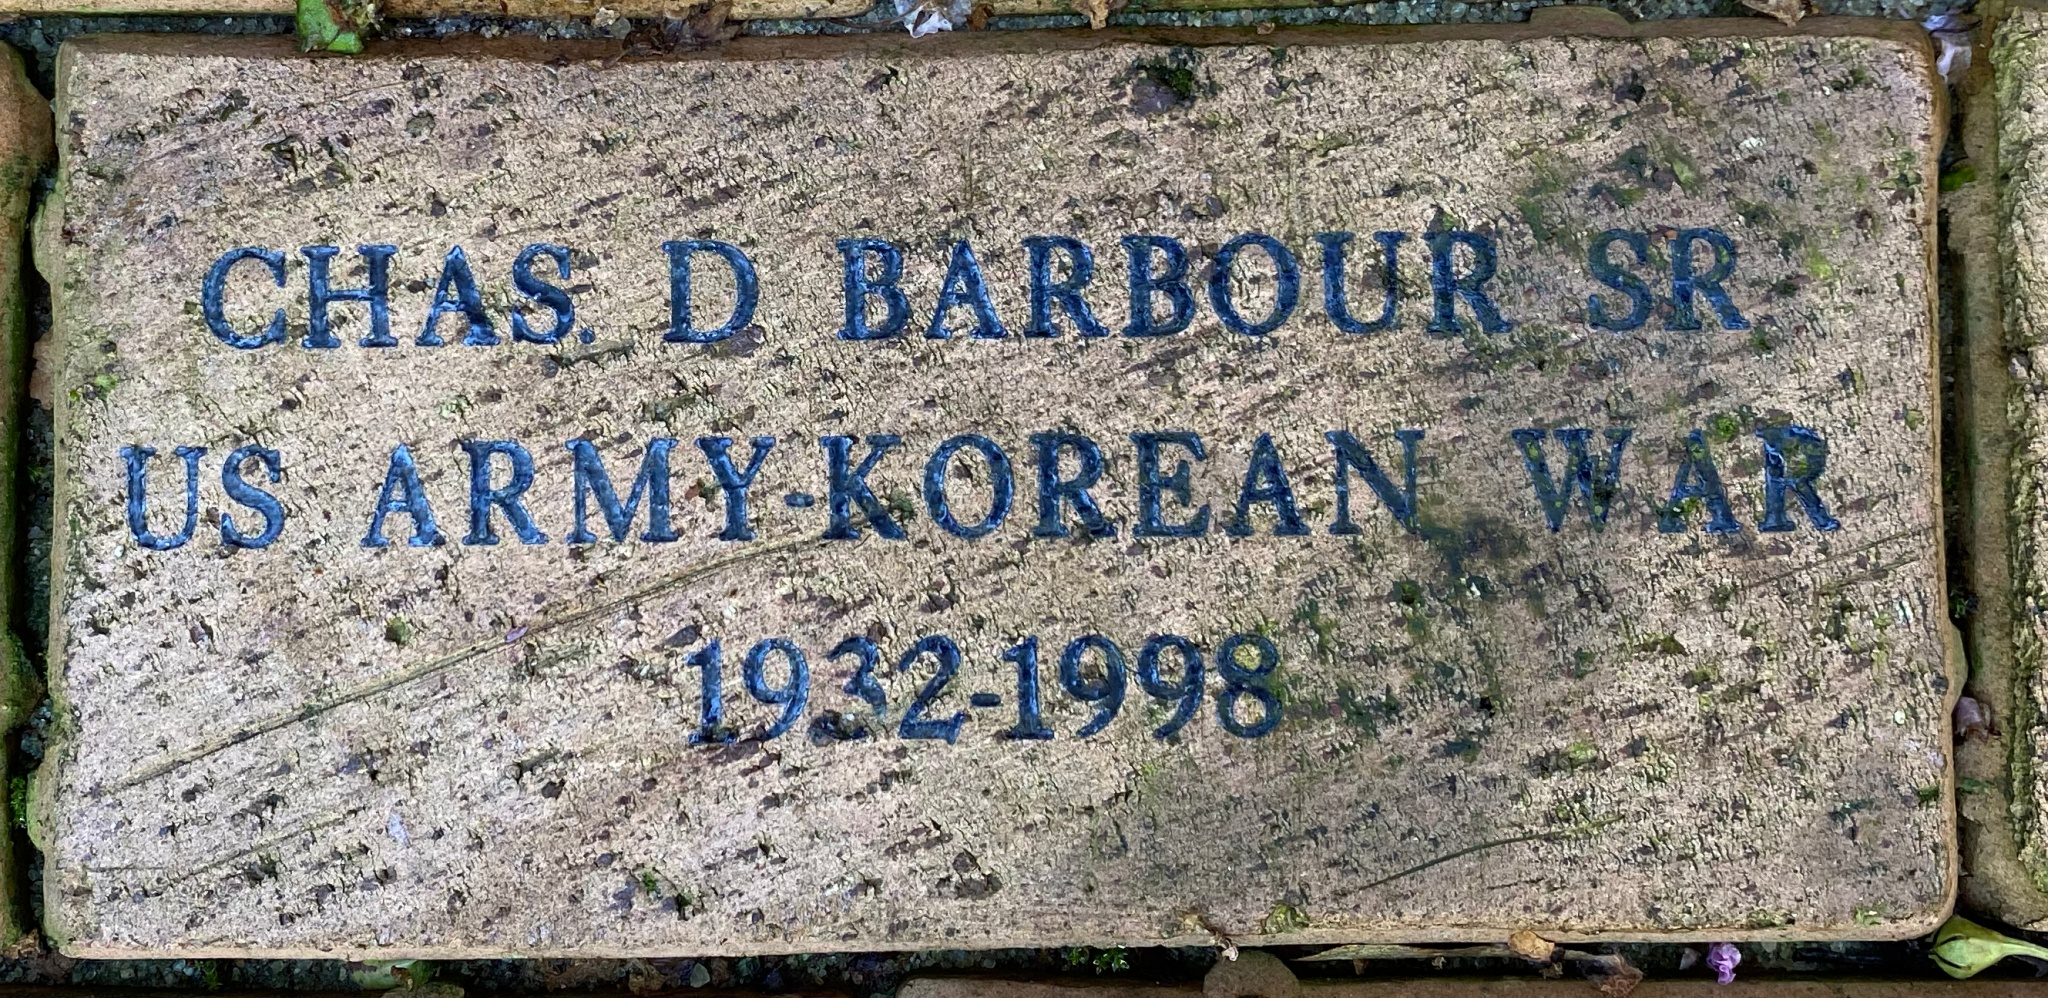 CHAS.D BARBOUR SR US ARMY-KOREAN WAR 1932-1998